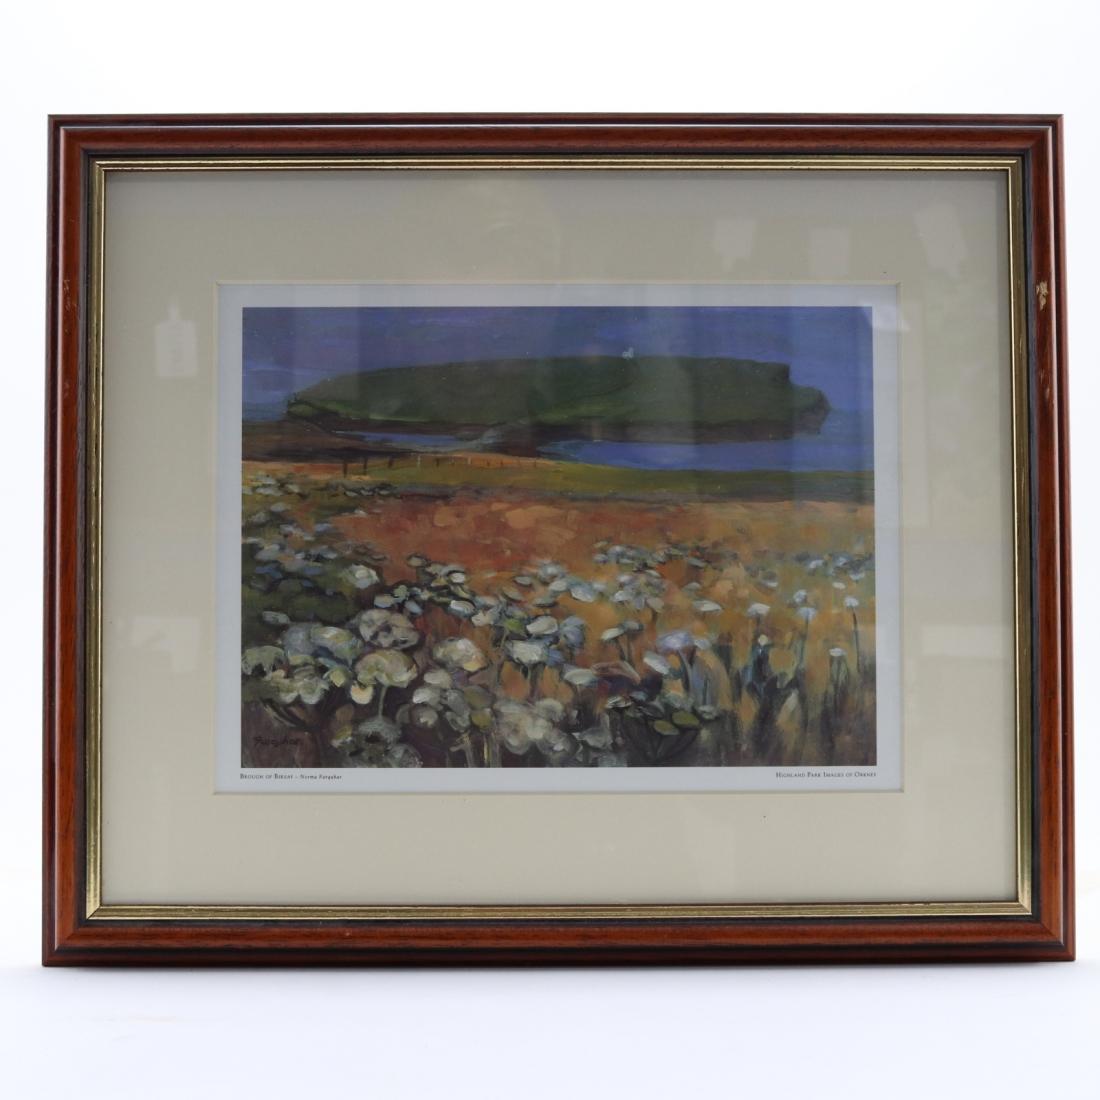 Highland Park Images of Orkney Framed Prints x 3 / Brough of Birsay, Swan's Nest, Hoy Sound